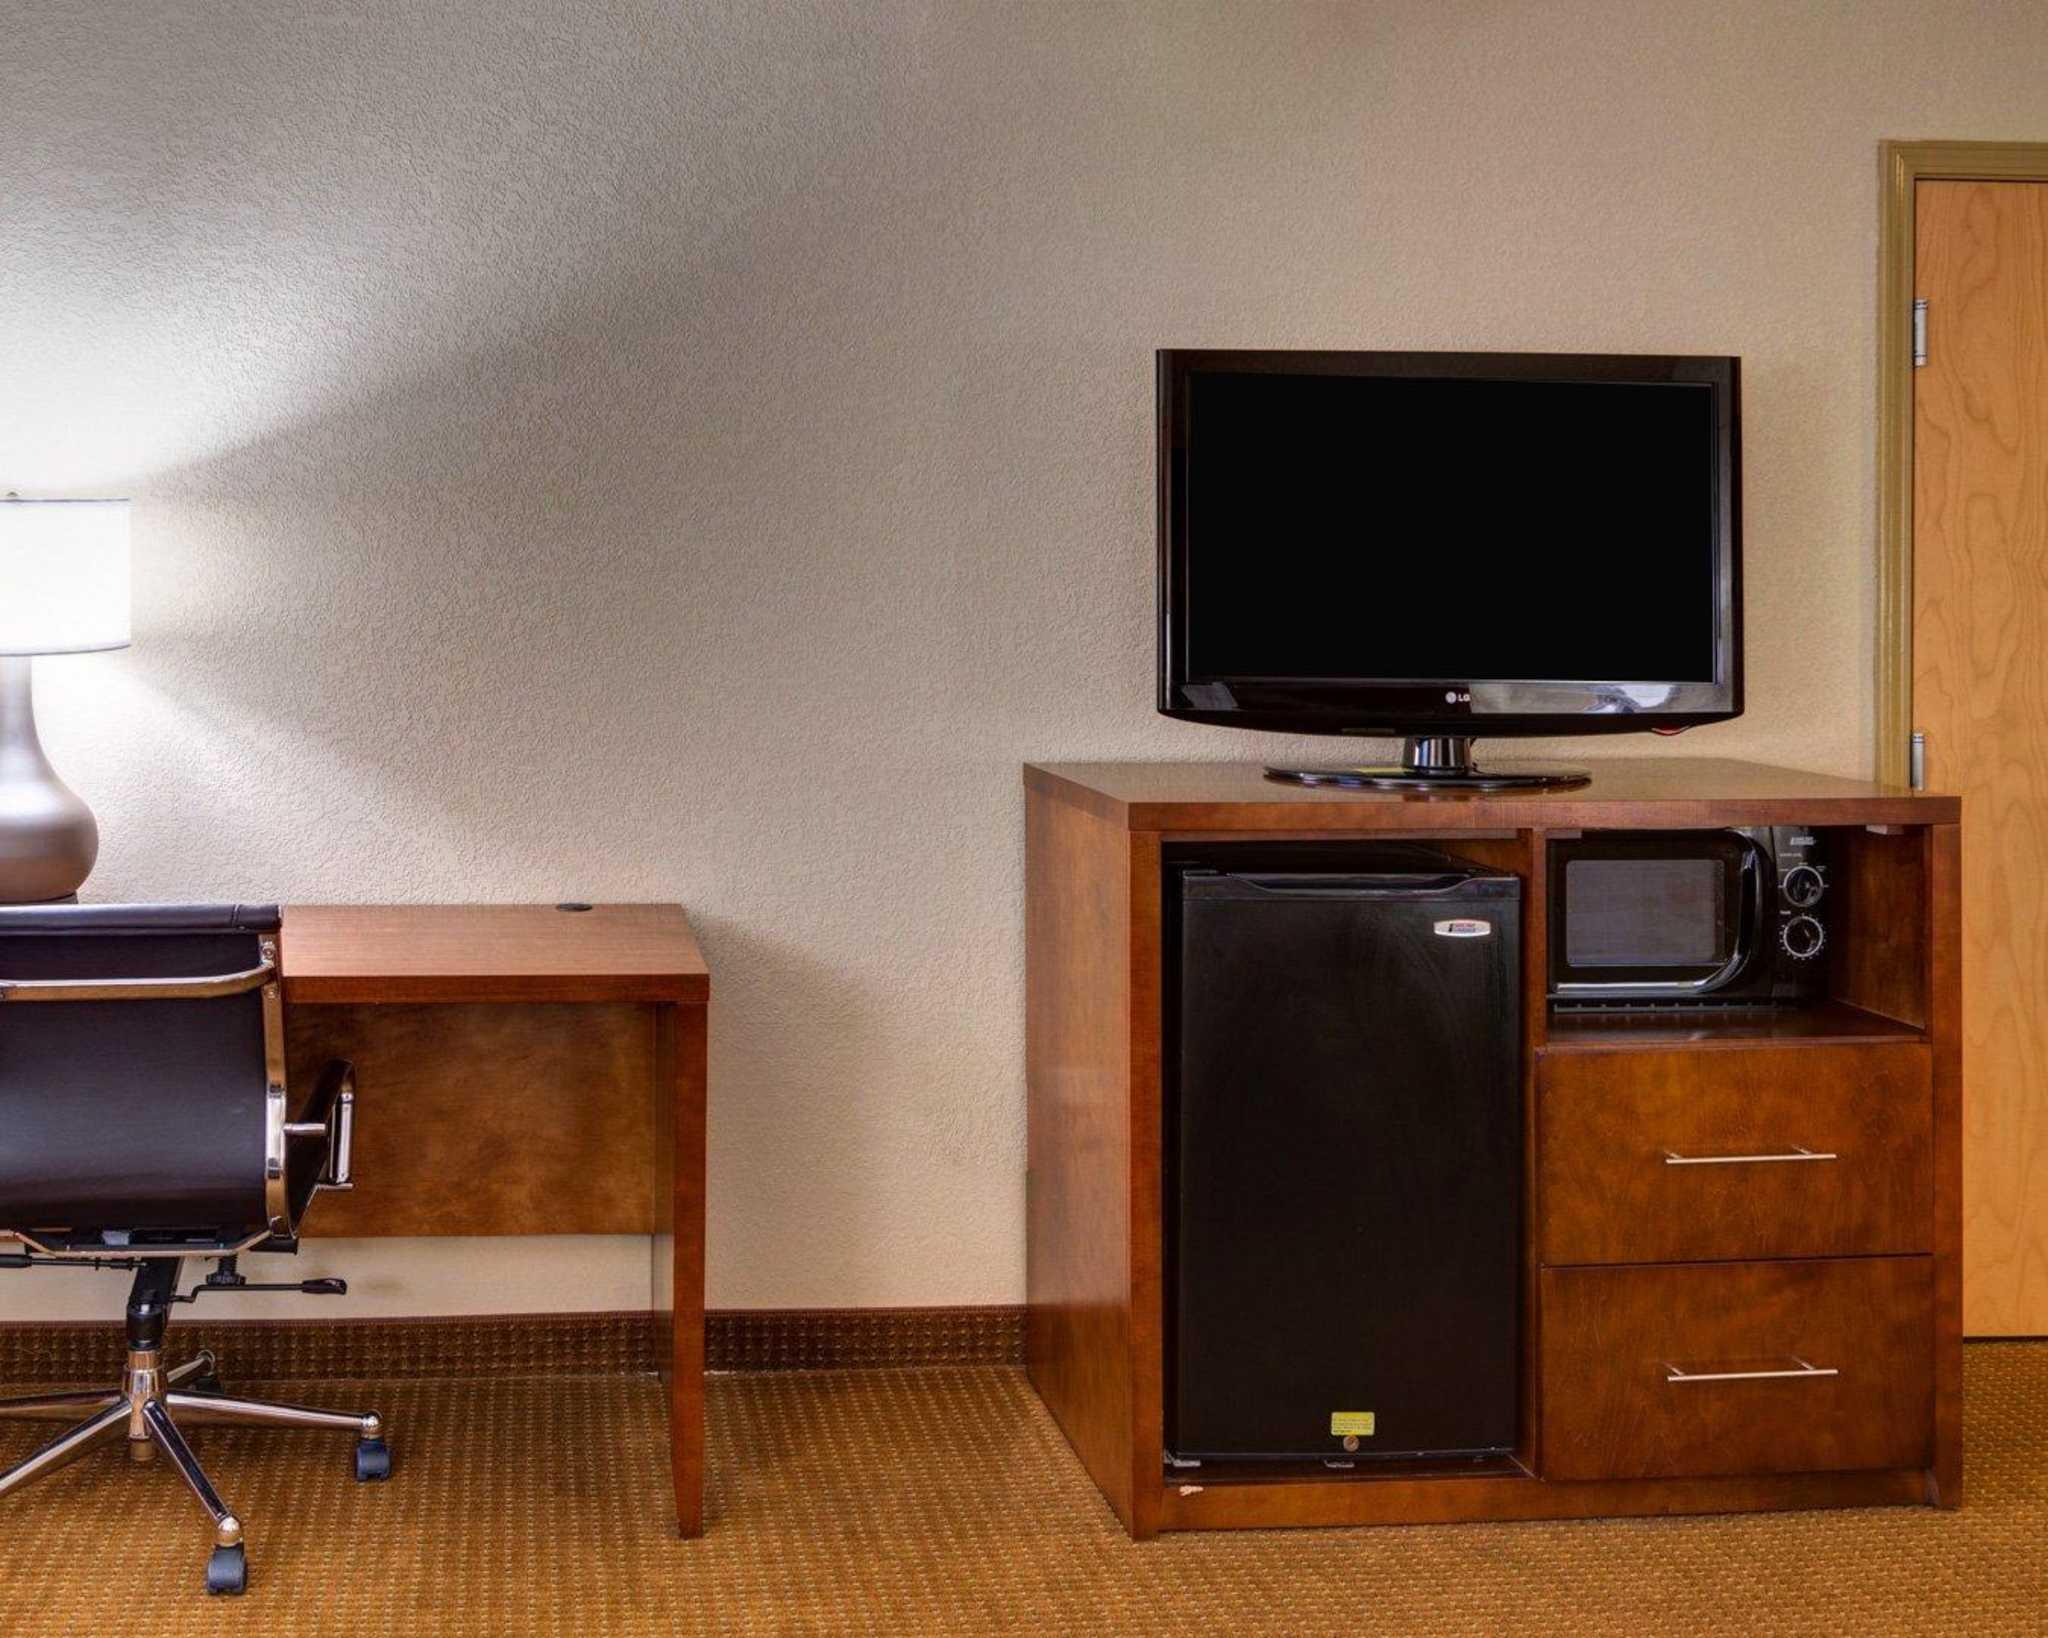 Comfort Inn Amp Suites At 30 Louis Prima Drive Covington